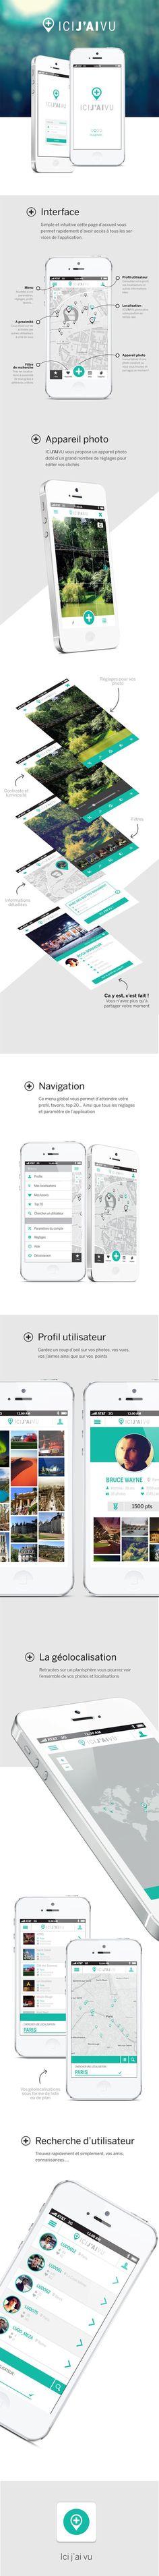 Application ICI J'AI VU by Nathalie Troucelier, via Behance: